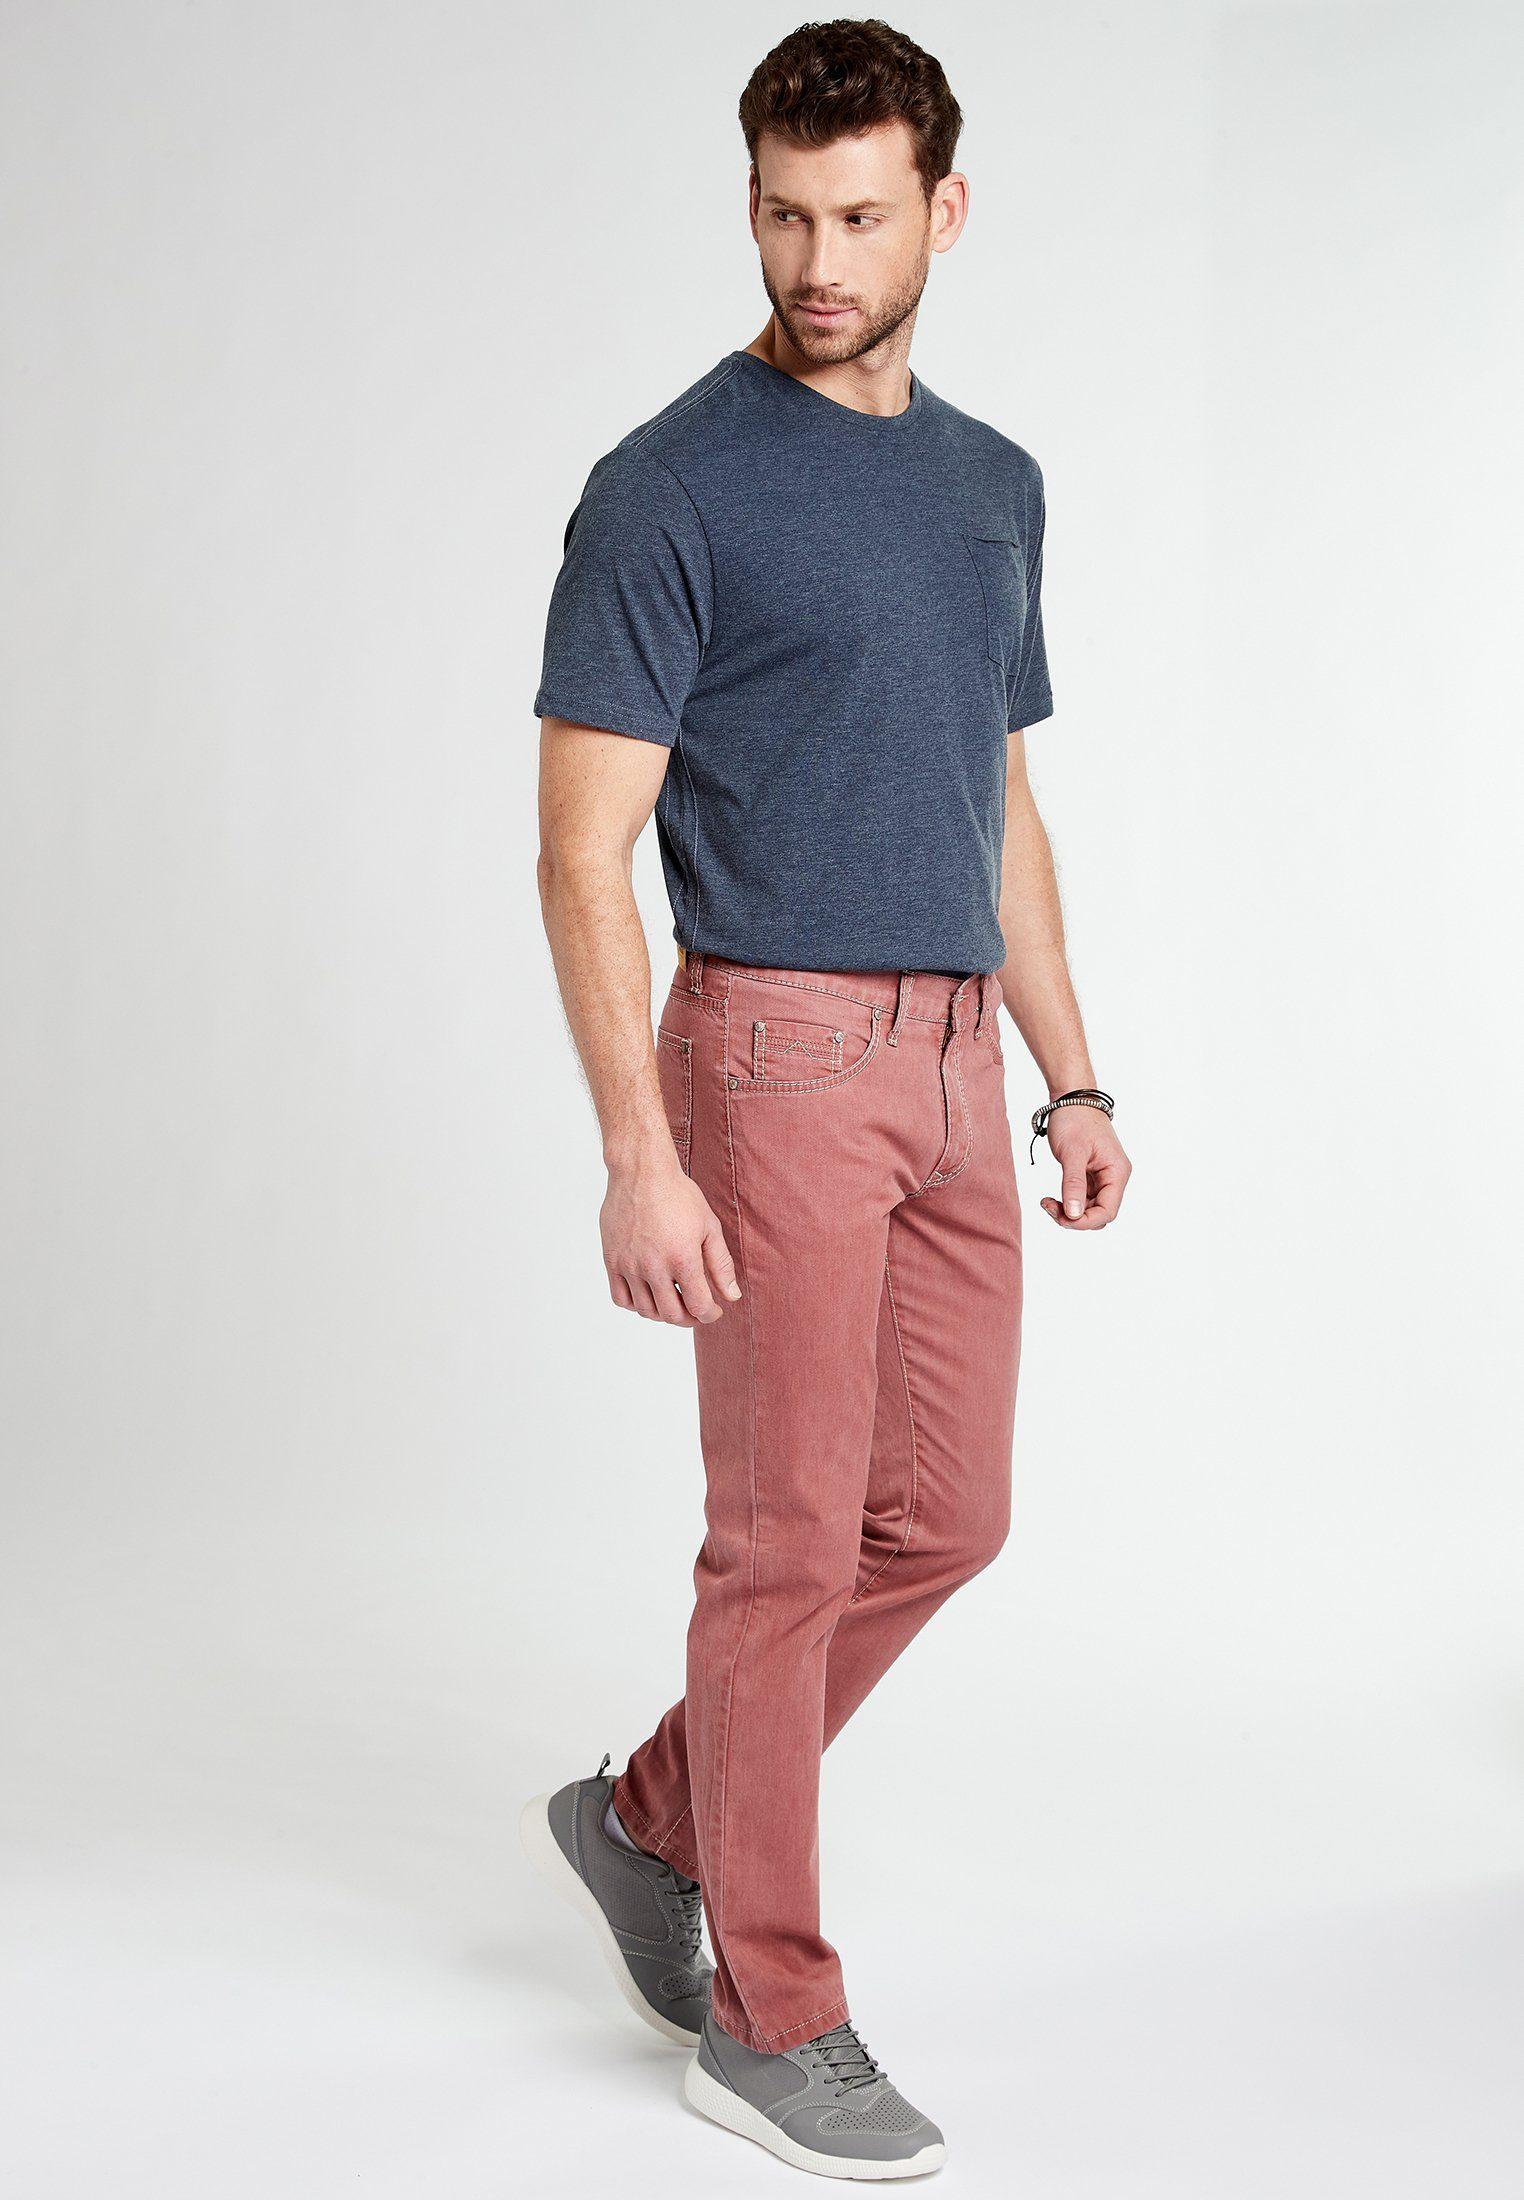 Jeans Authentic Kaufen Online Pioneer Herrenhose Rando« »herrenhose uKcTl5FJ13